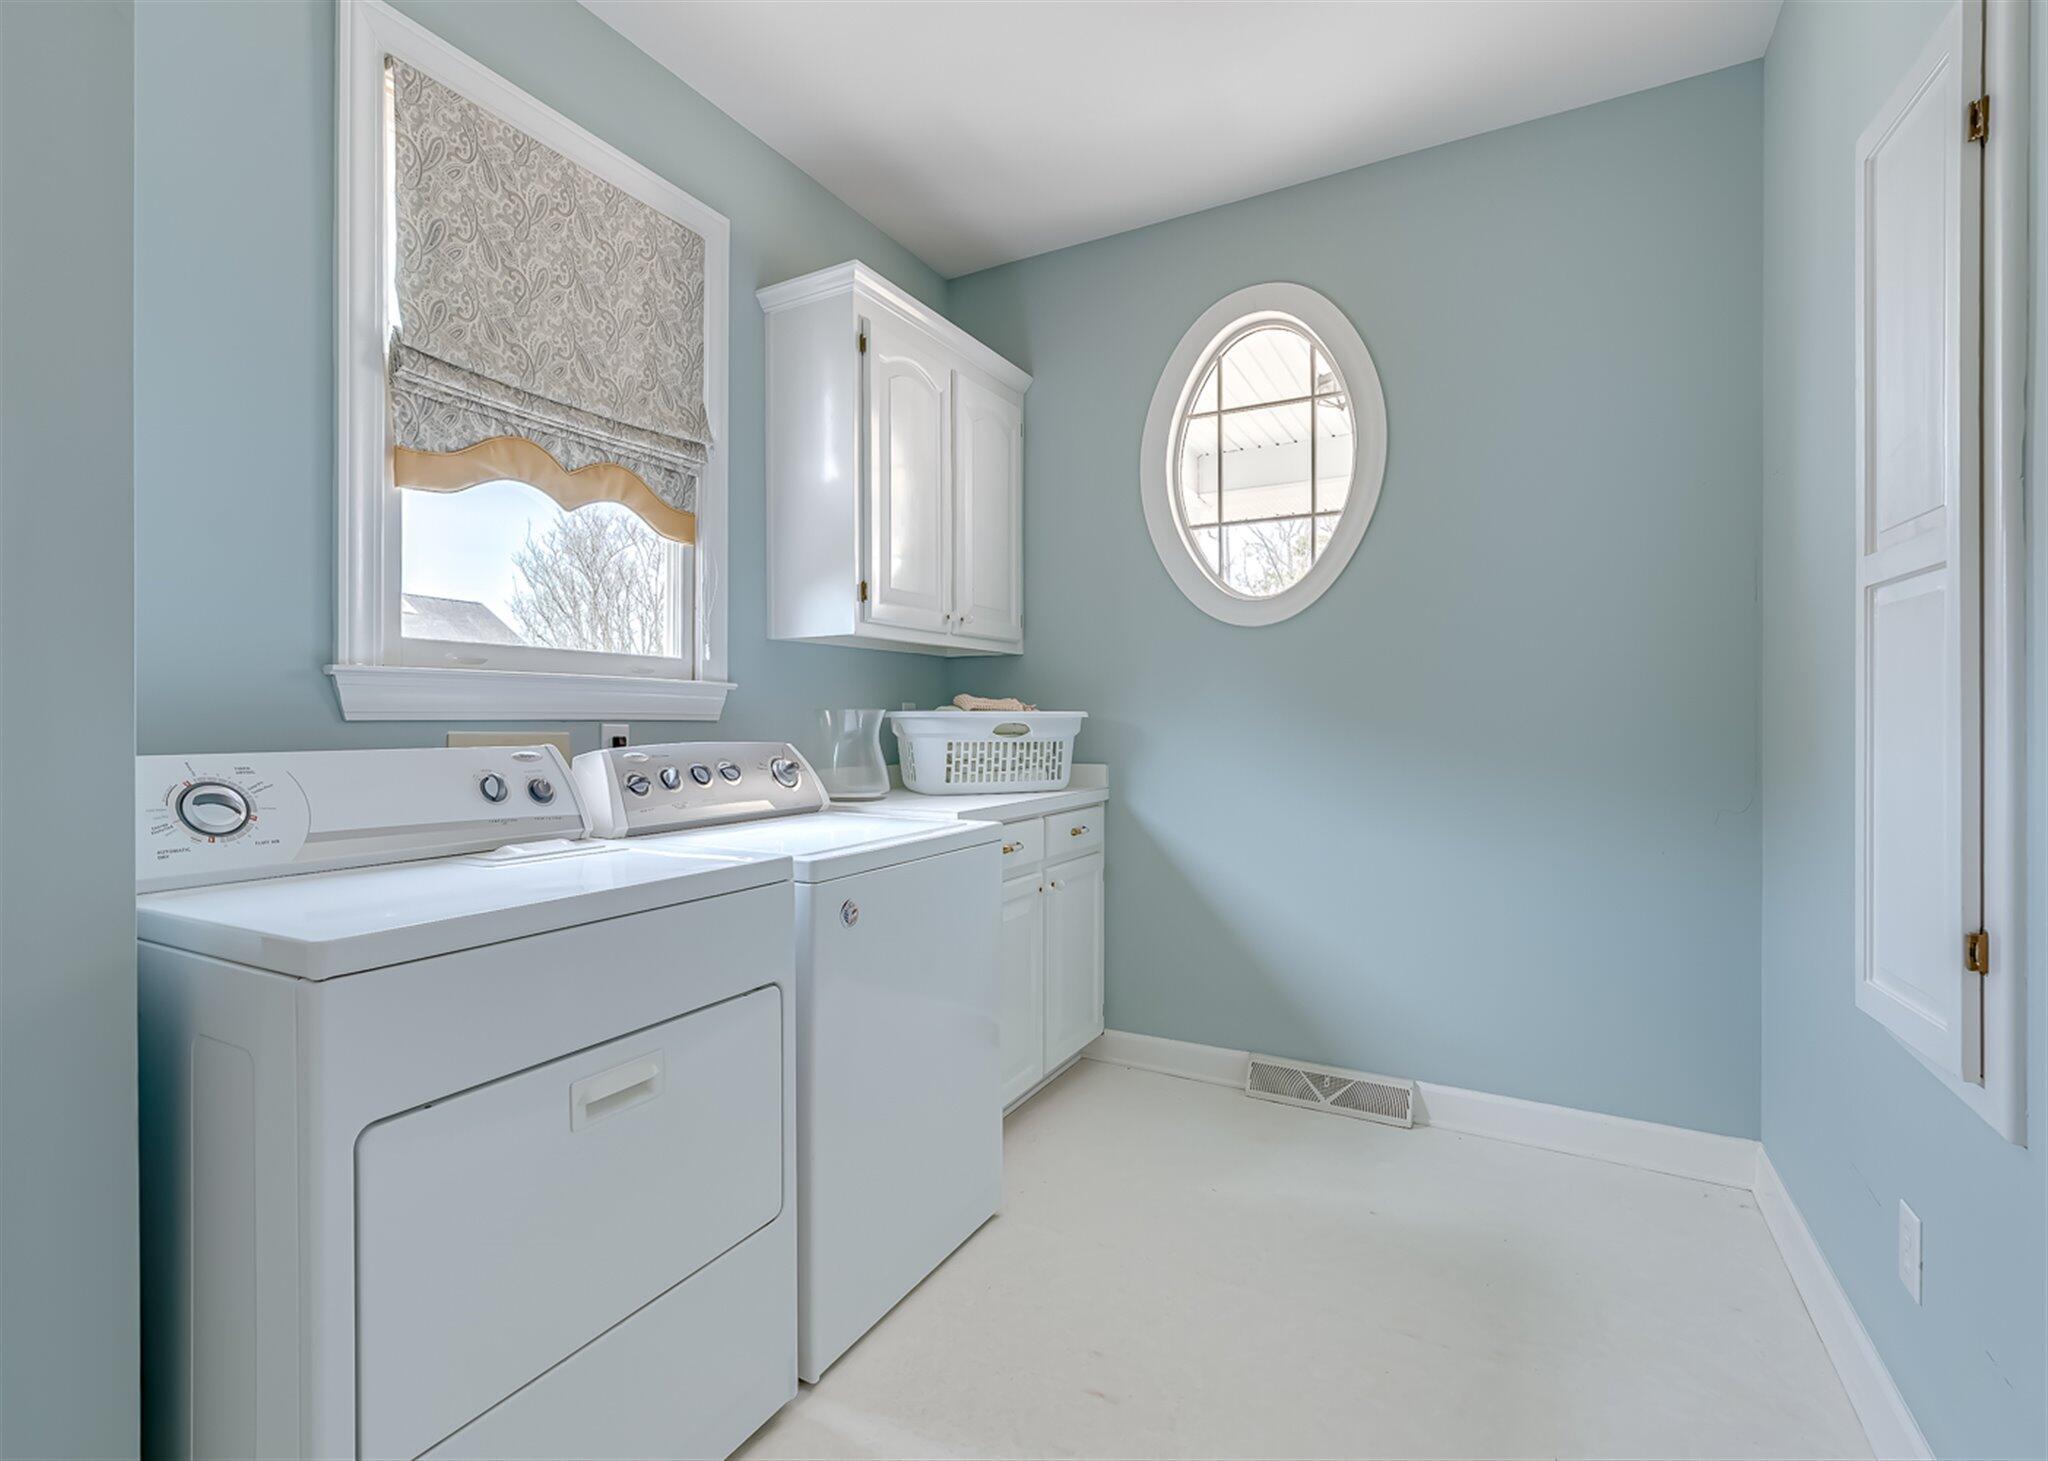 Indigo Point Homes For Sale - 50 Indigo Point, Charleston, SC - 19